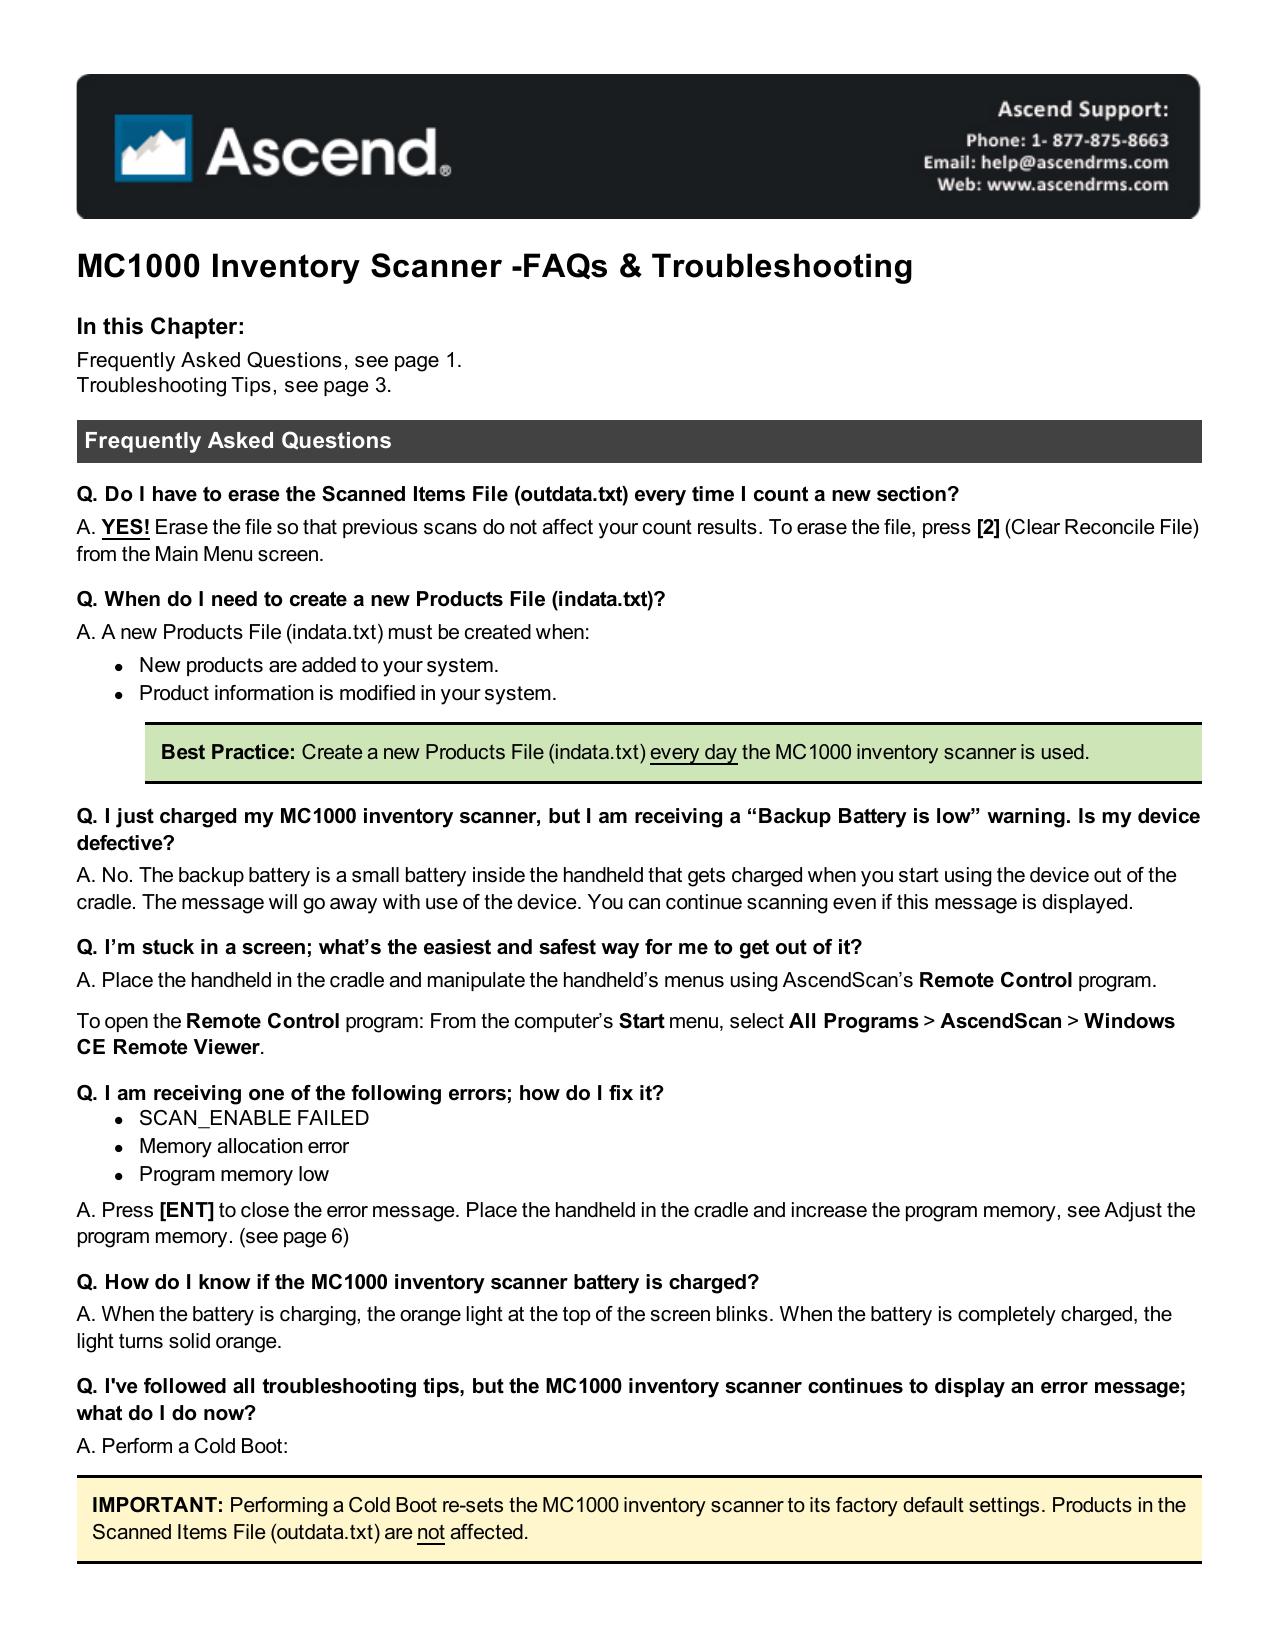 MC1000 FAQs & Troubleshooting | manualzz com